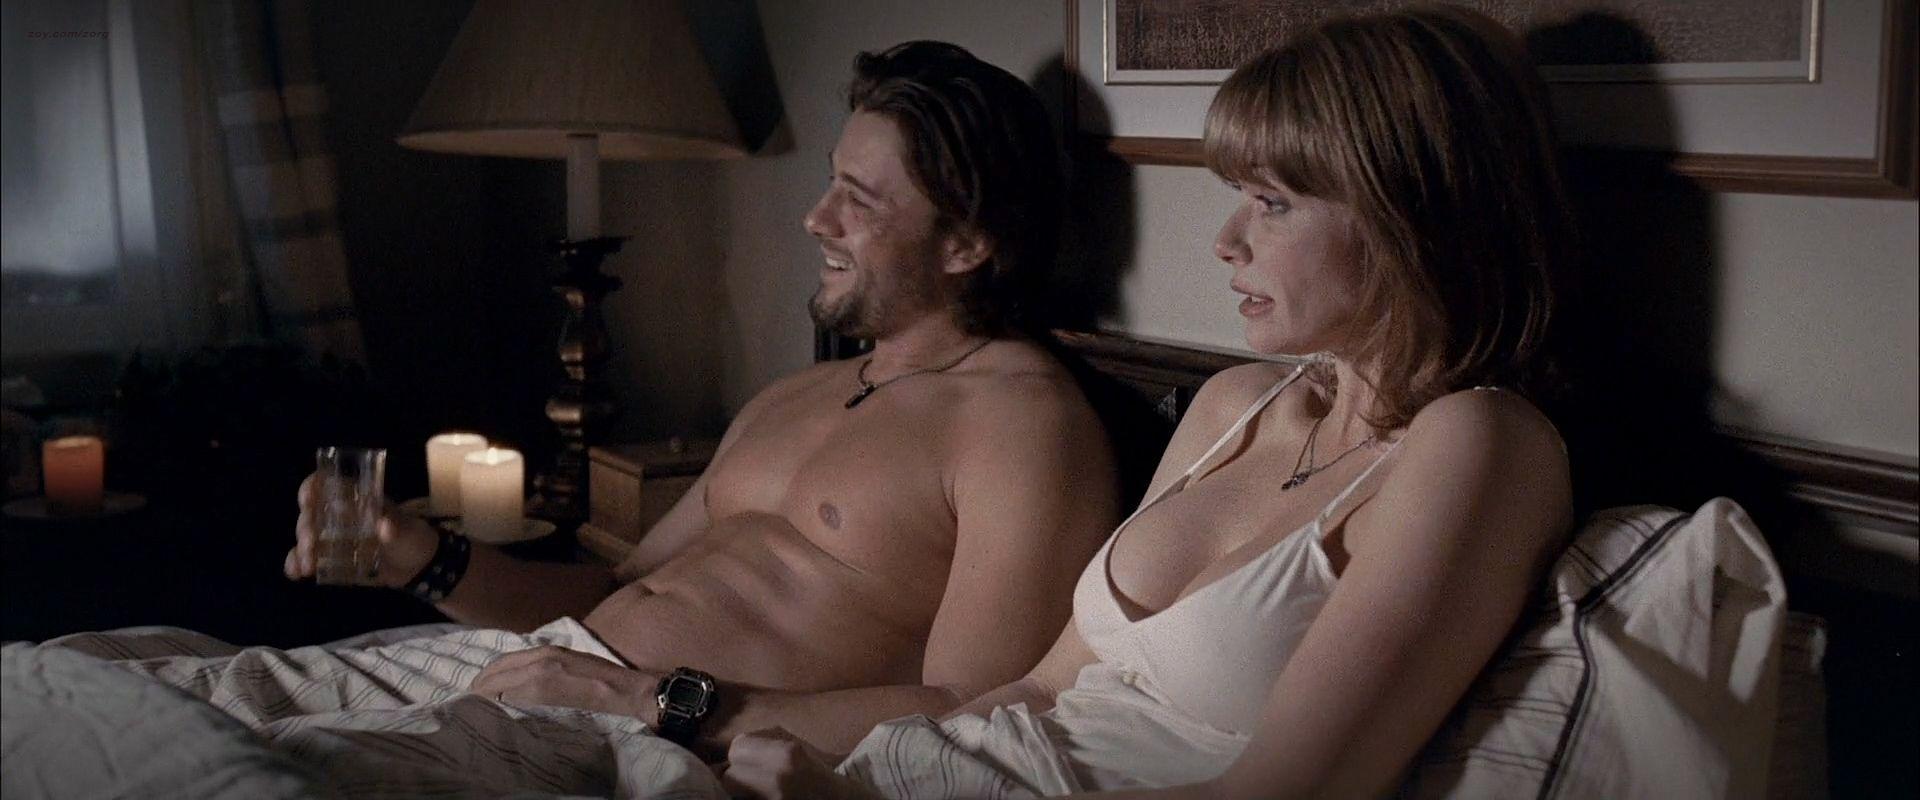 Tameka cottle nude naked